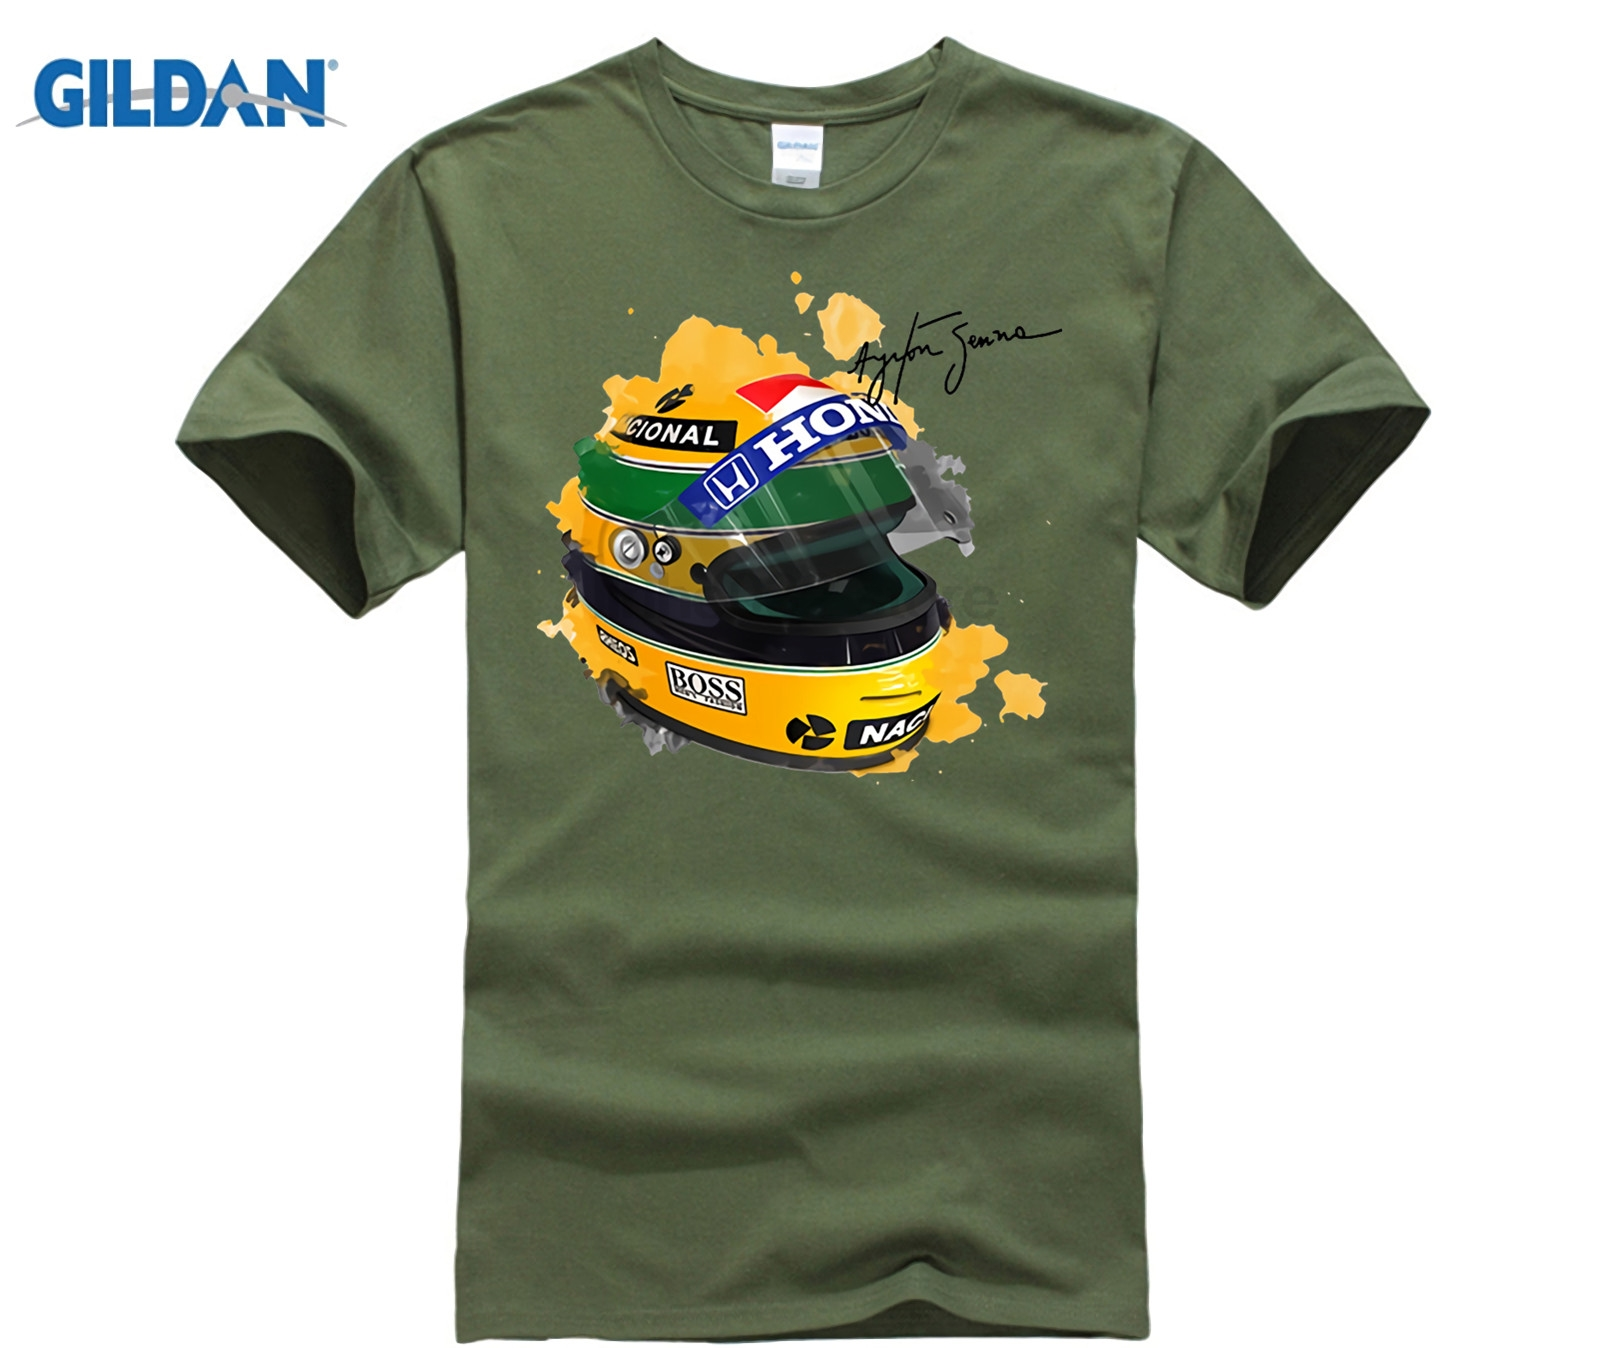 gildan-ayrton-font-b-senna-b-font-helmet-t-shirt-tops-1-race-car-watercolor-men-100-cotton-short-sleeve-tee-shirt-signature-man-t-shirt